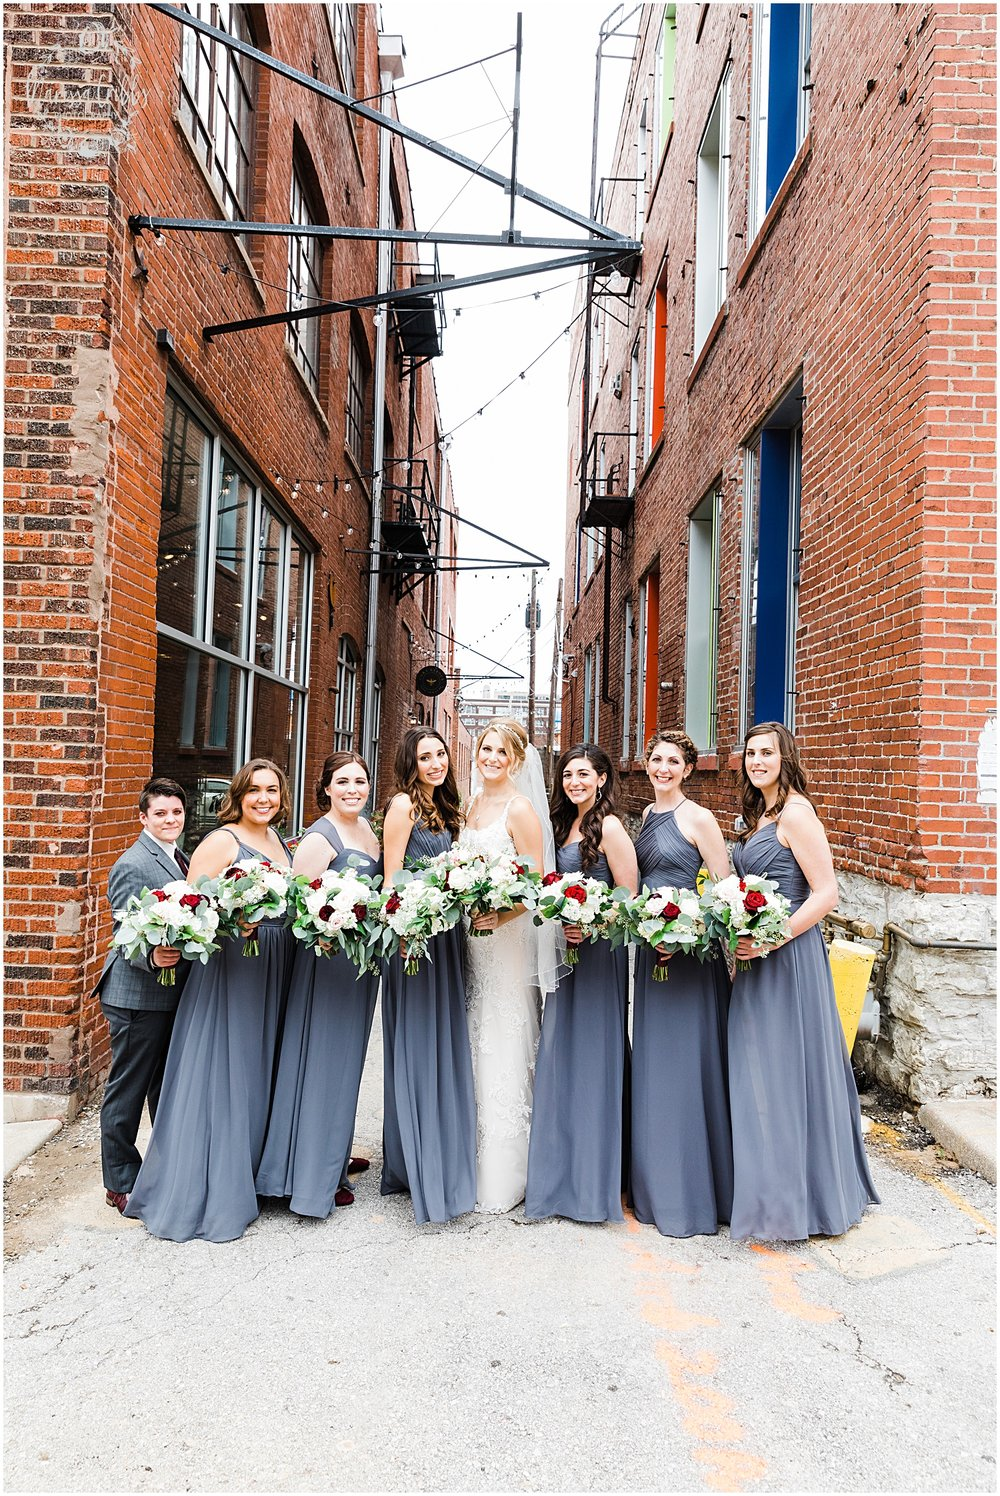 BAUER WEDDING | KELSEA & JUSTIN | MARISSA CRIBBS PHOTOGRAPHY_6518.jpg